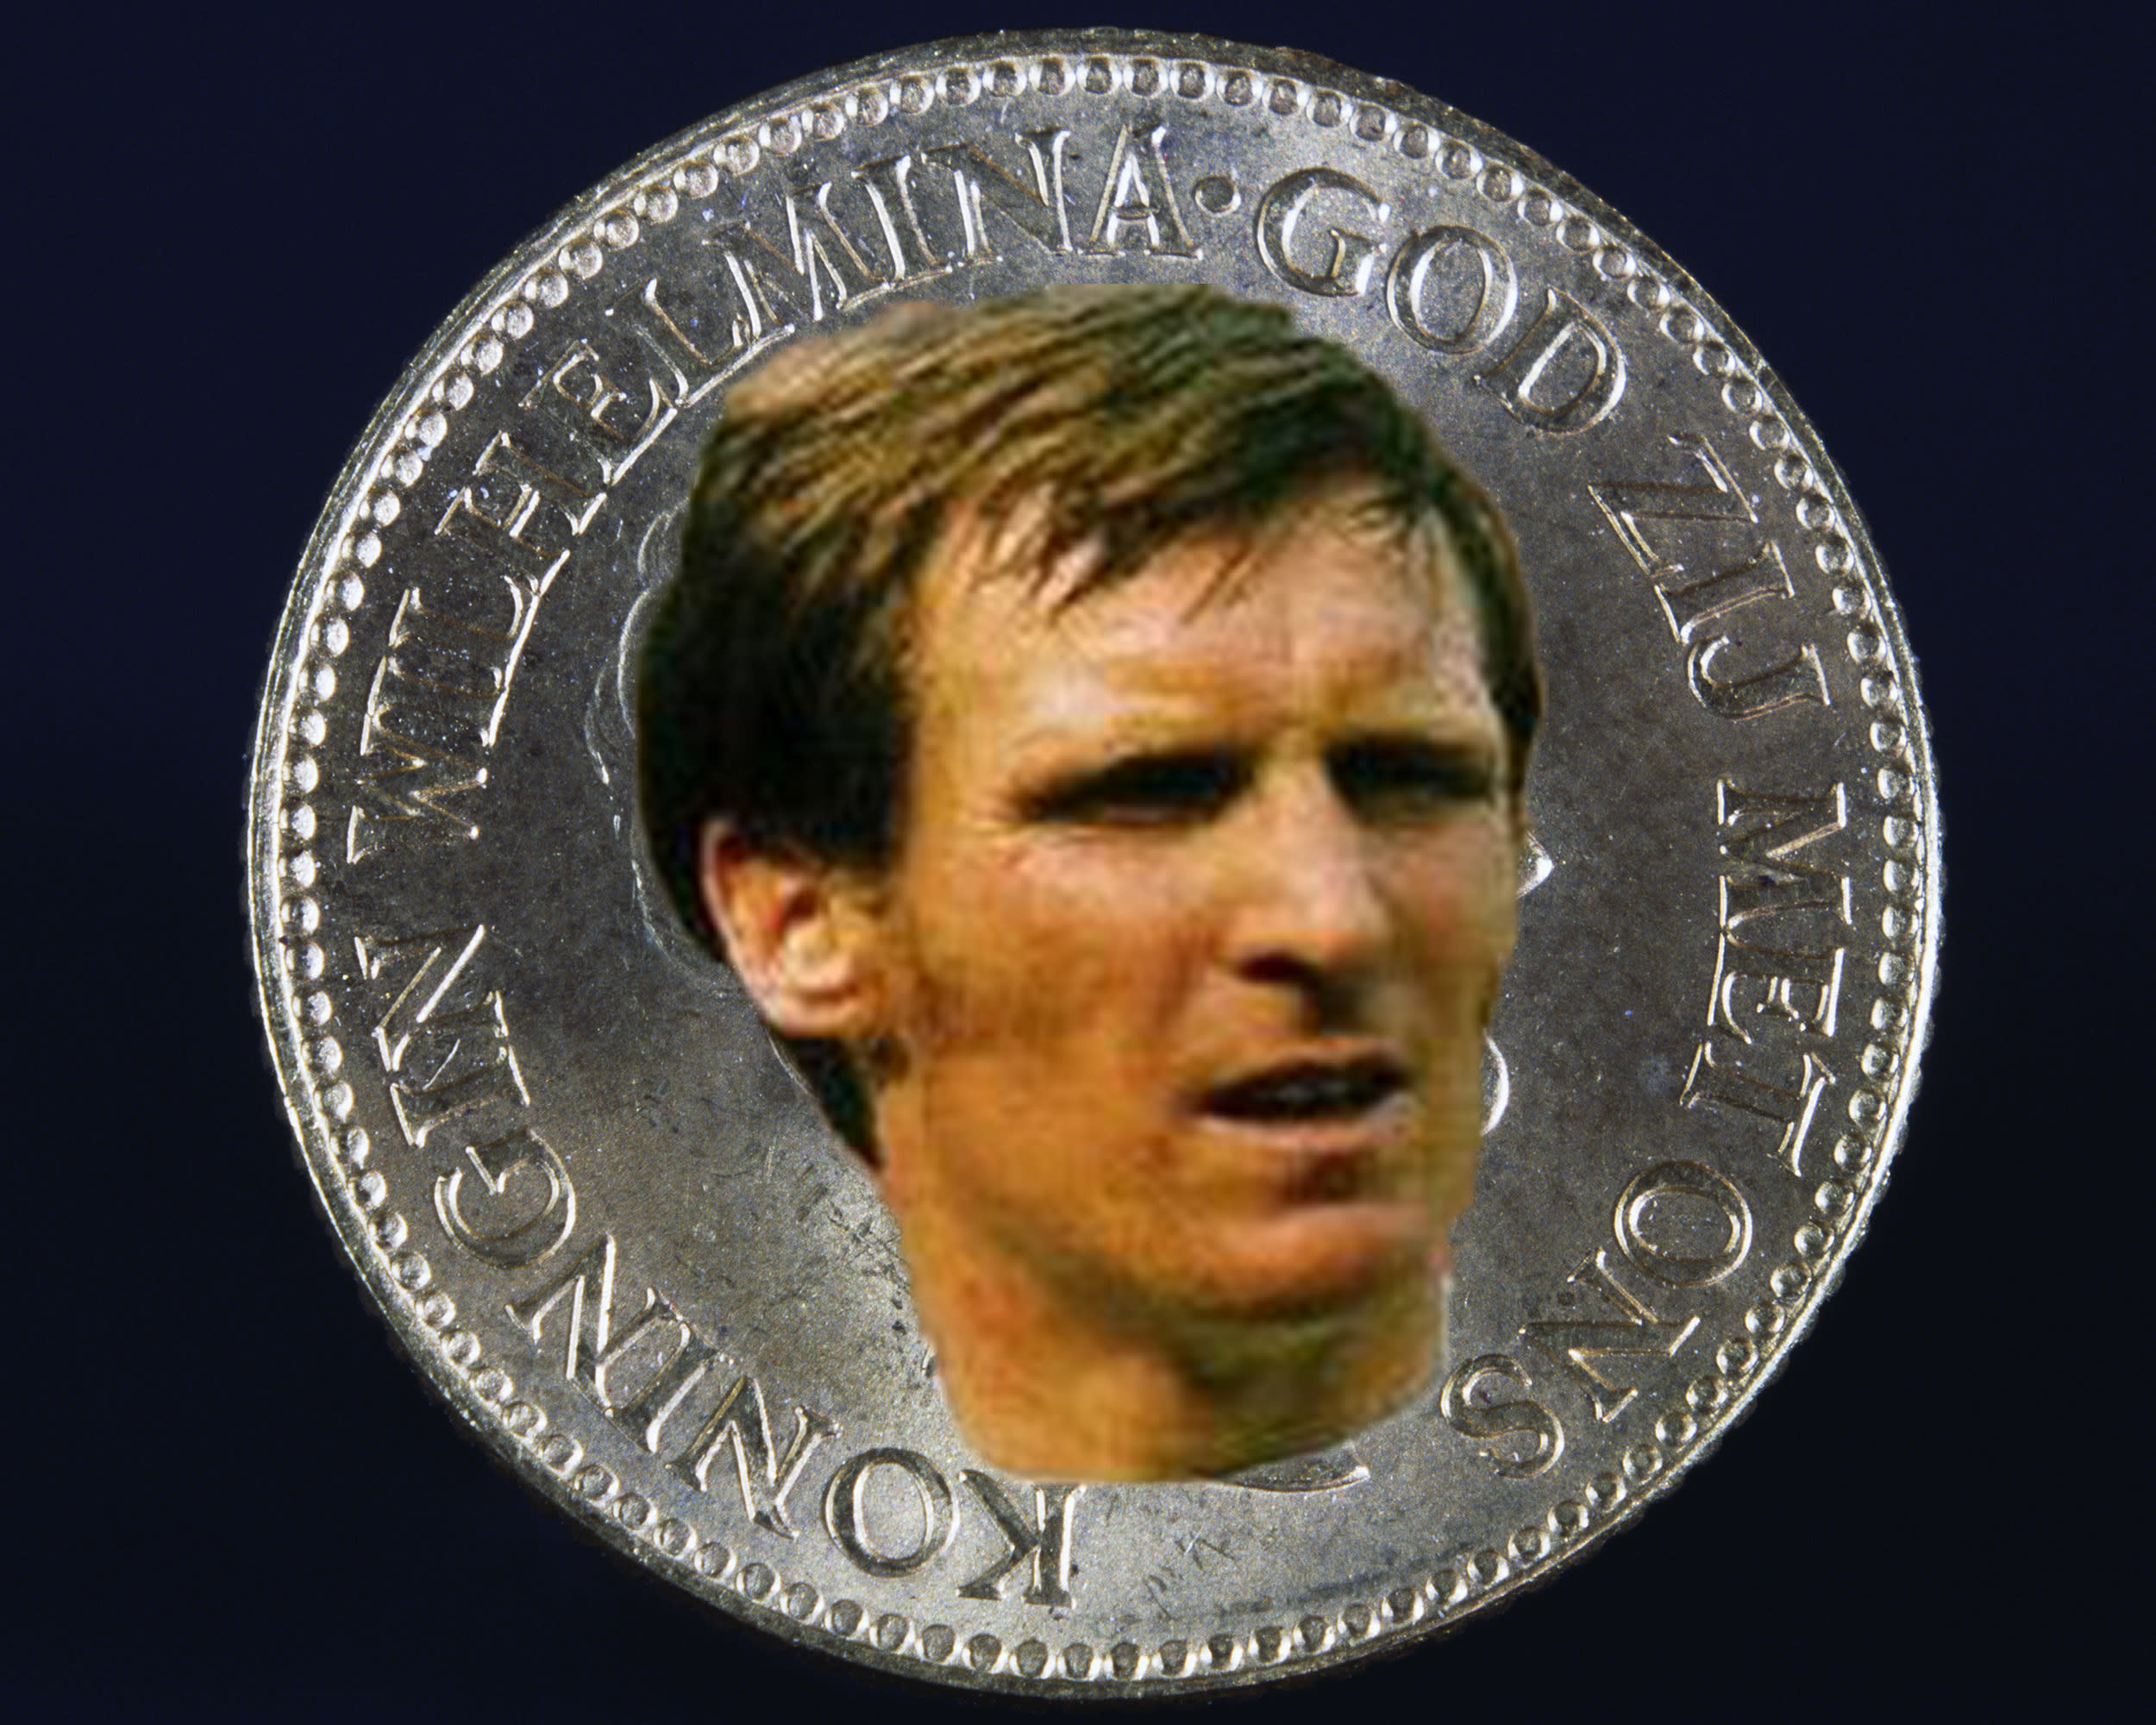 Glasgow Celtic Billy Mcneill Bhoys European Cup Final Winners Coin Gift Set 1967